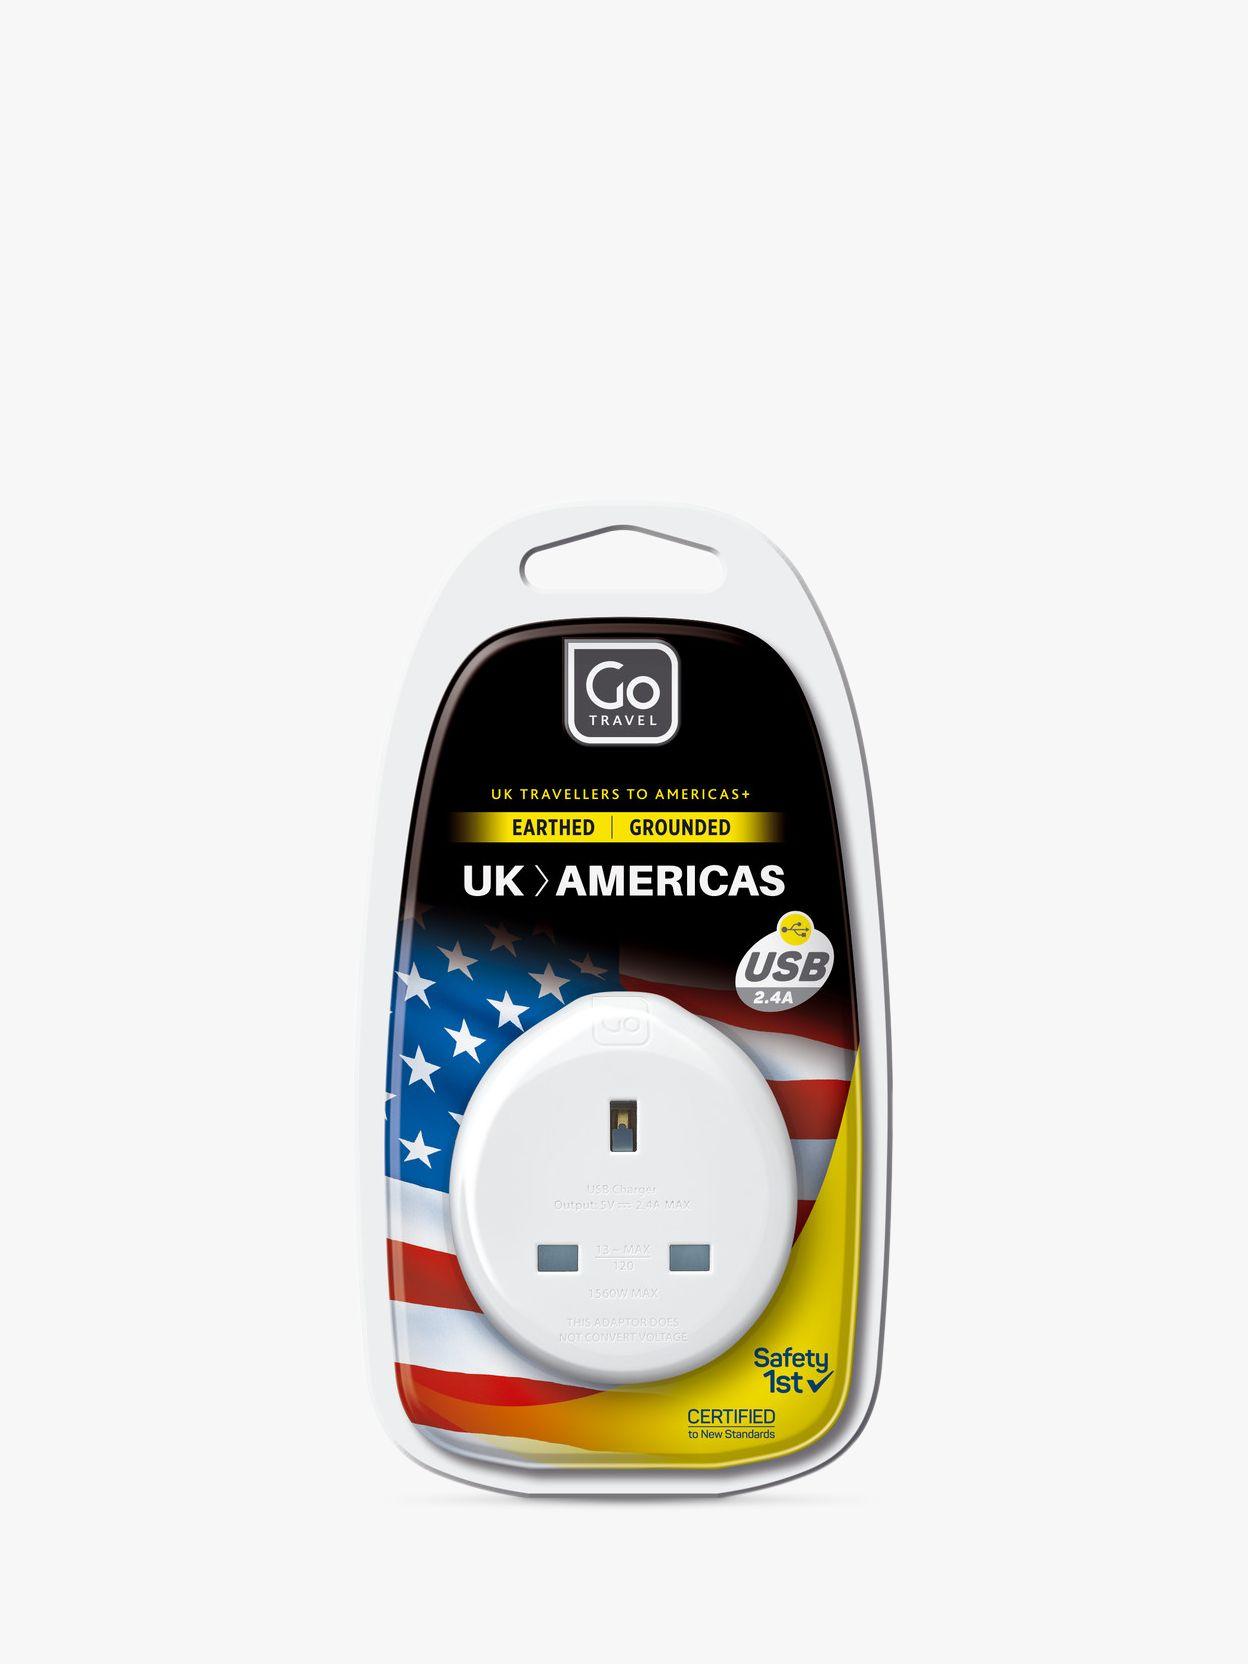 Go Travel Go Travel USB UK to USA Travel Adaptor